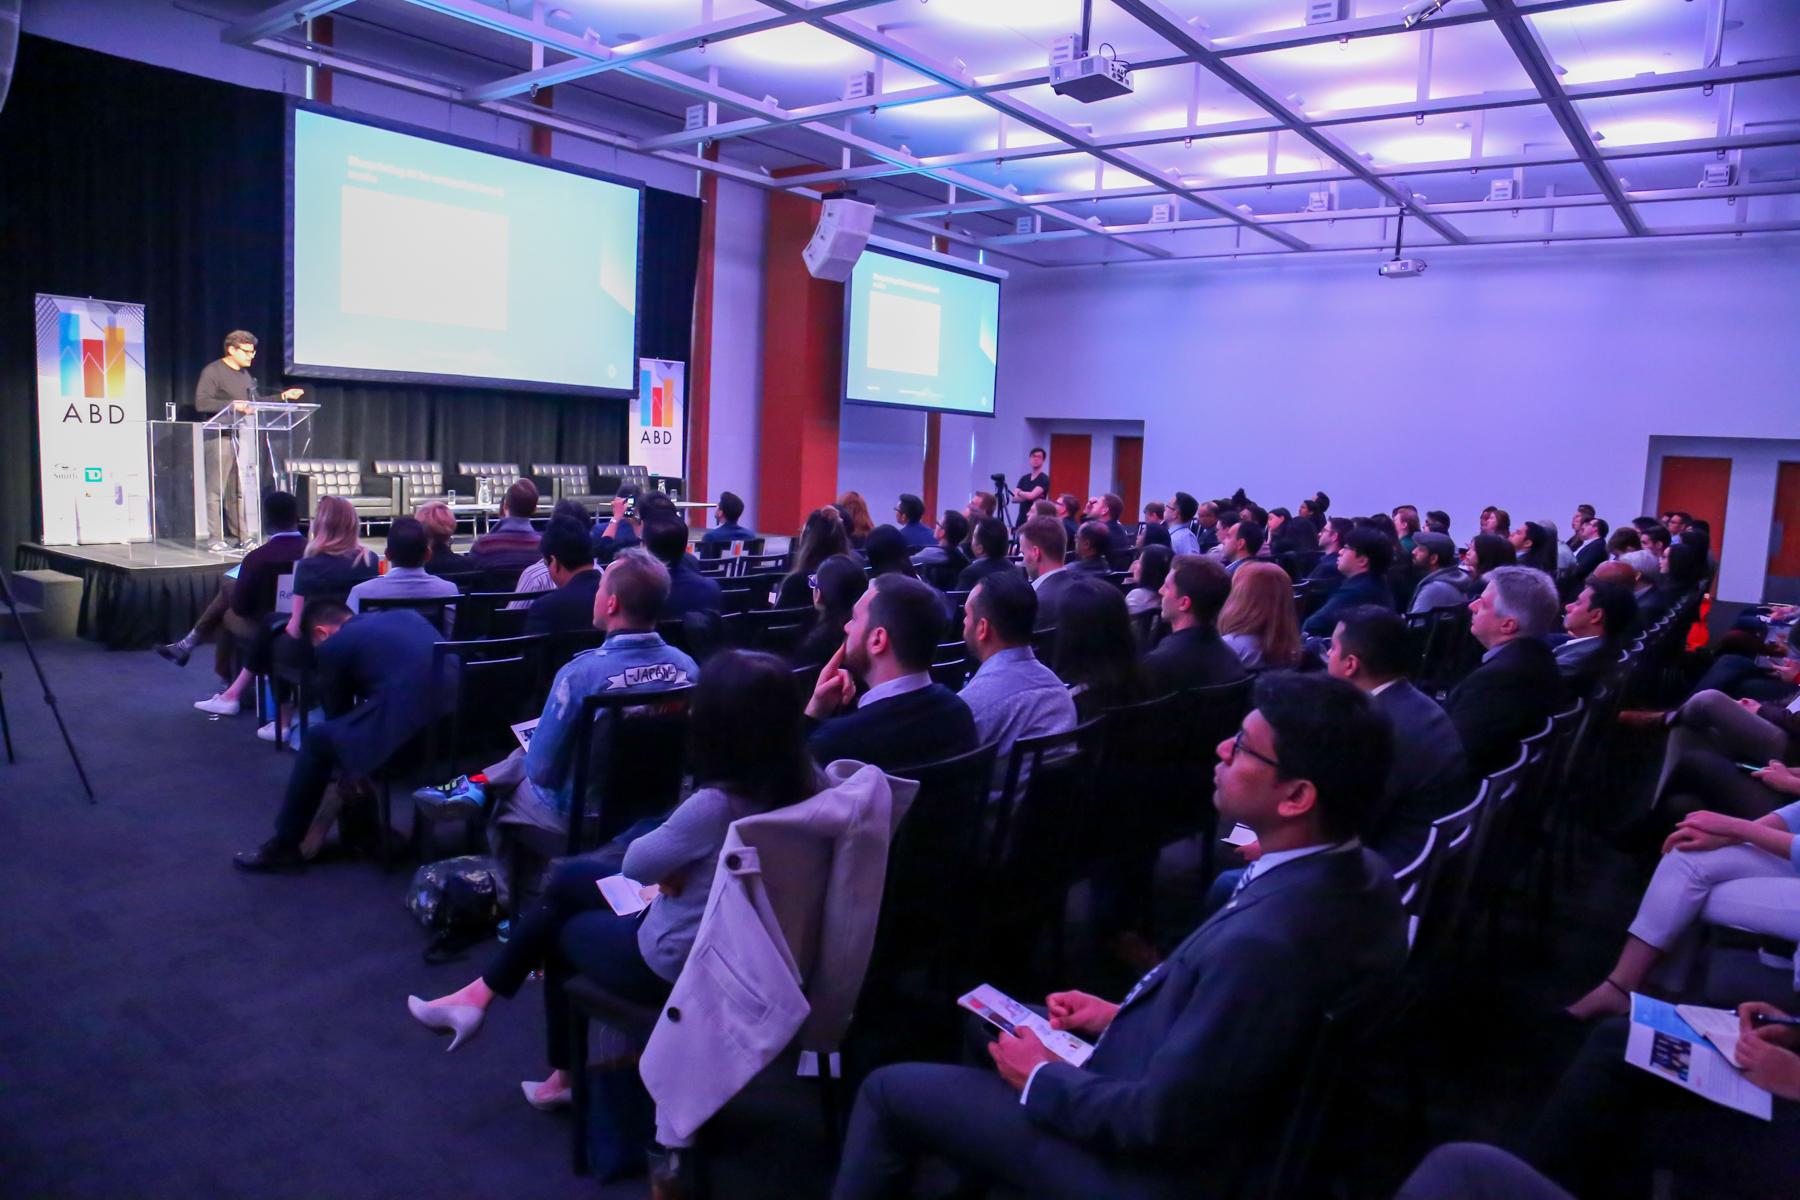 ABD_Conference_2018-010.jpg